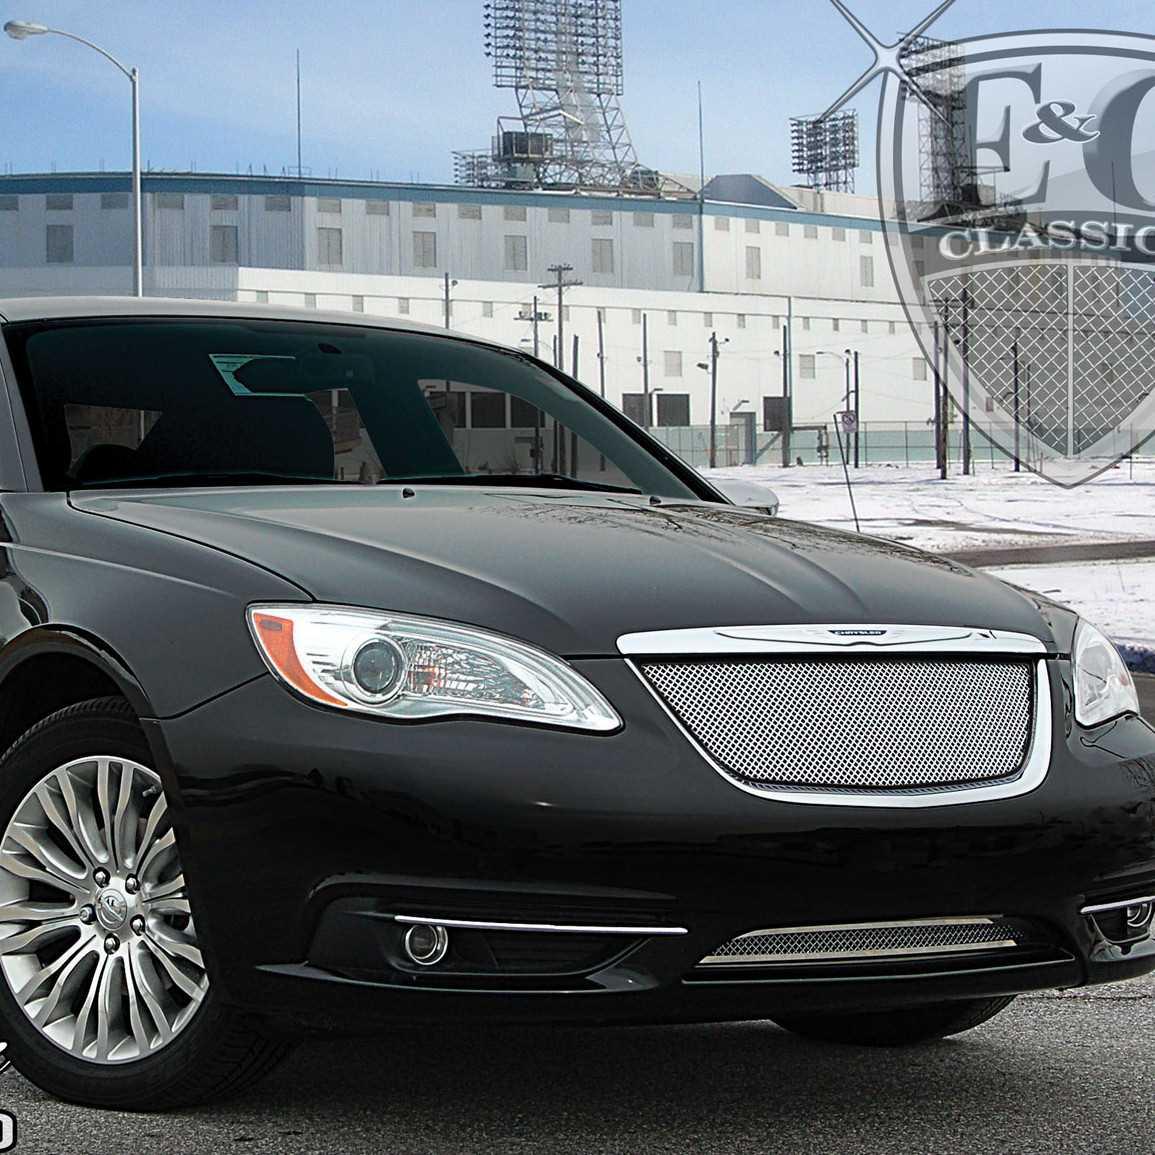 E&G Classics 2011-2014 Chrysler 200 Grille 2Pc Fine Mesh